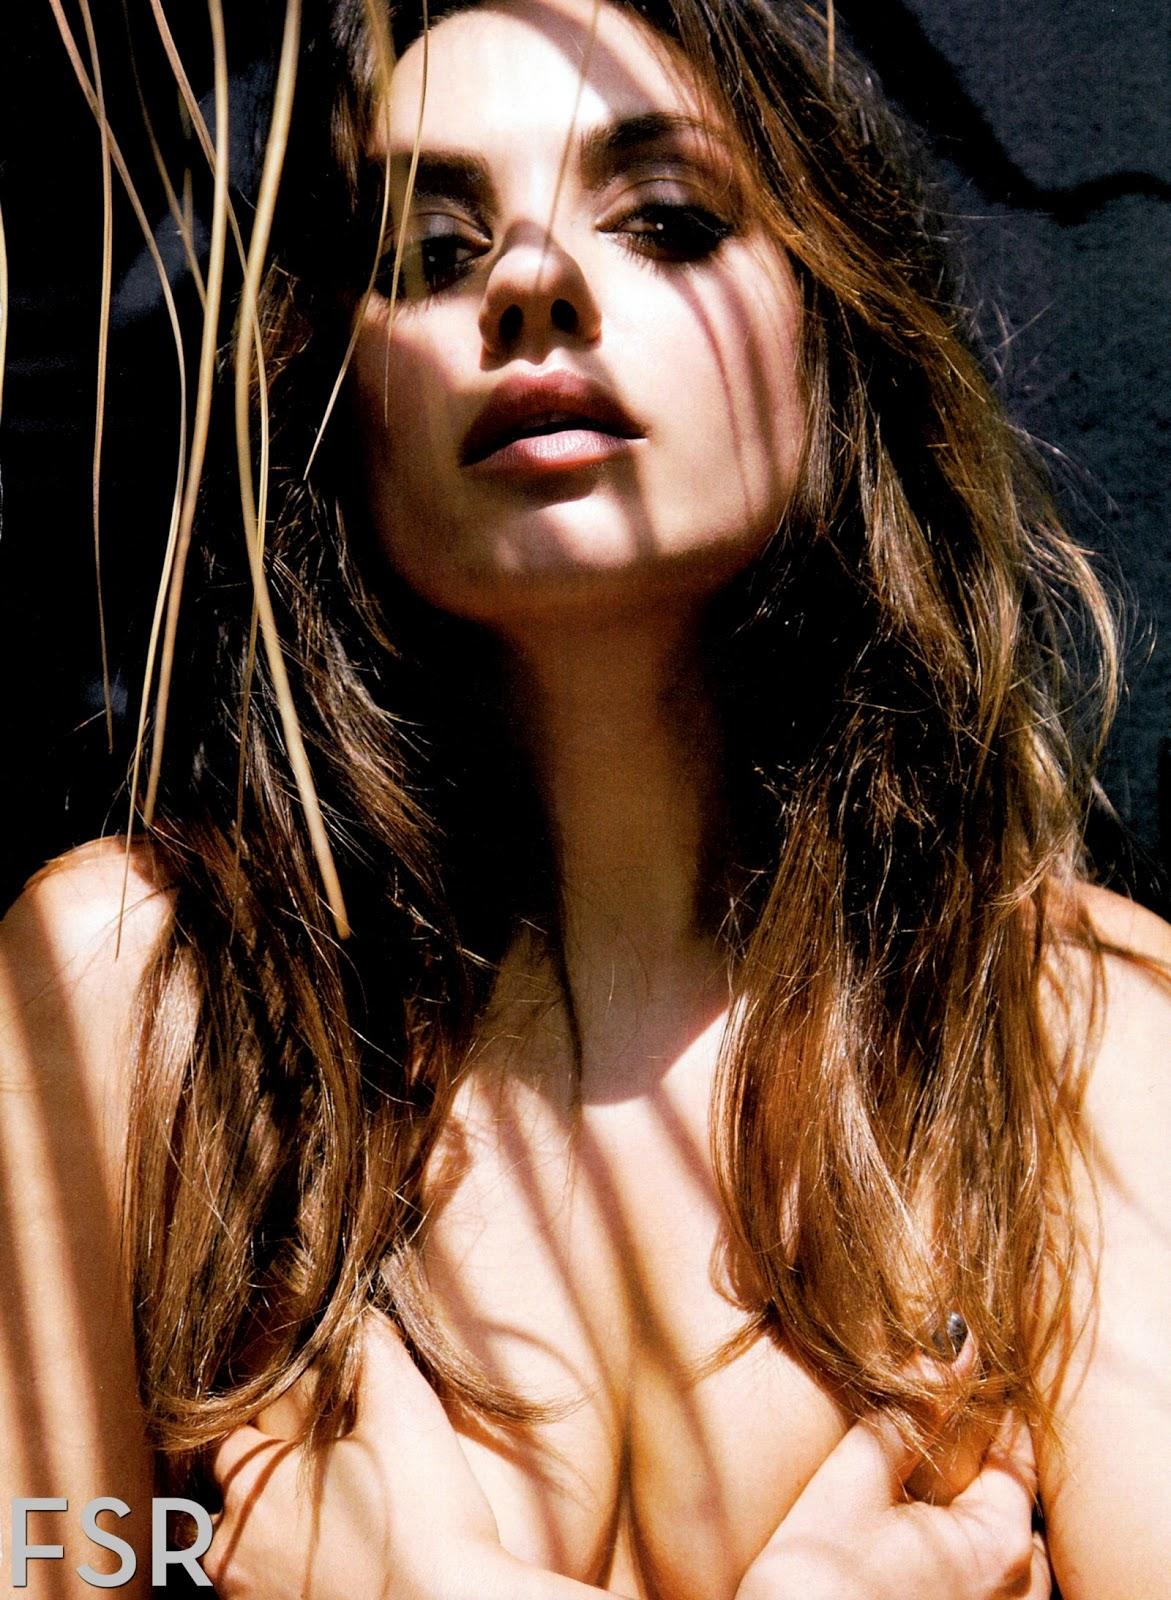 http://3.bp.blogspot.com/-wHqbm957bZo/UHSh9_zkL8I/AAAAAAAACjA/4DLICaByf9Y/s1600/Mila-Kunis-esquire-novembro-2012-mulher-mais-sexy-do-mundo-2.jpg